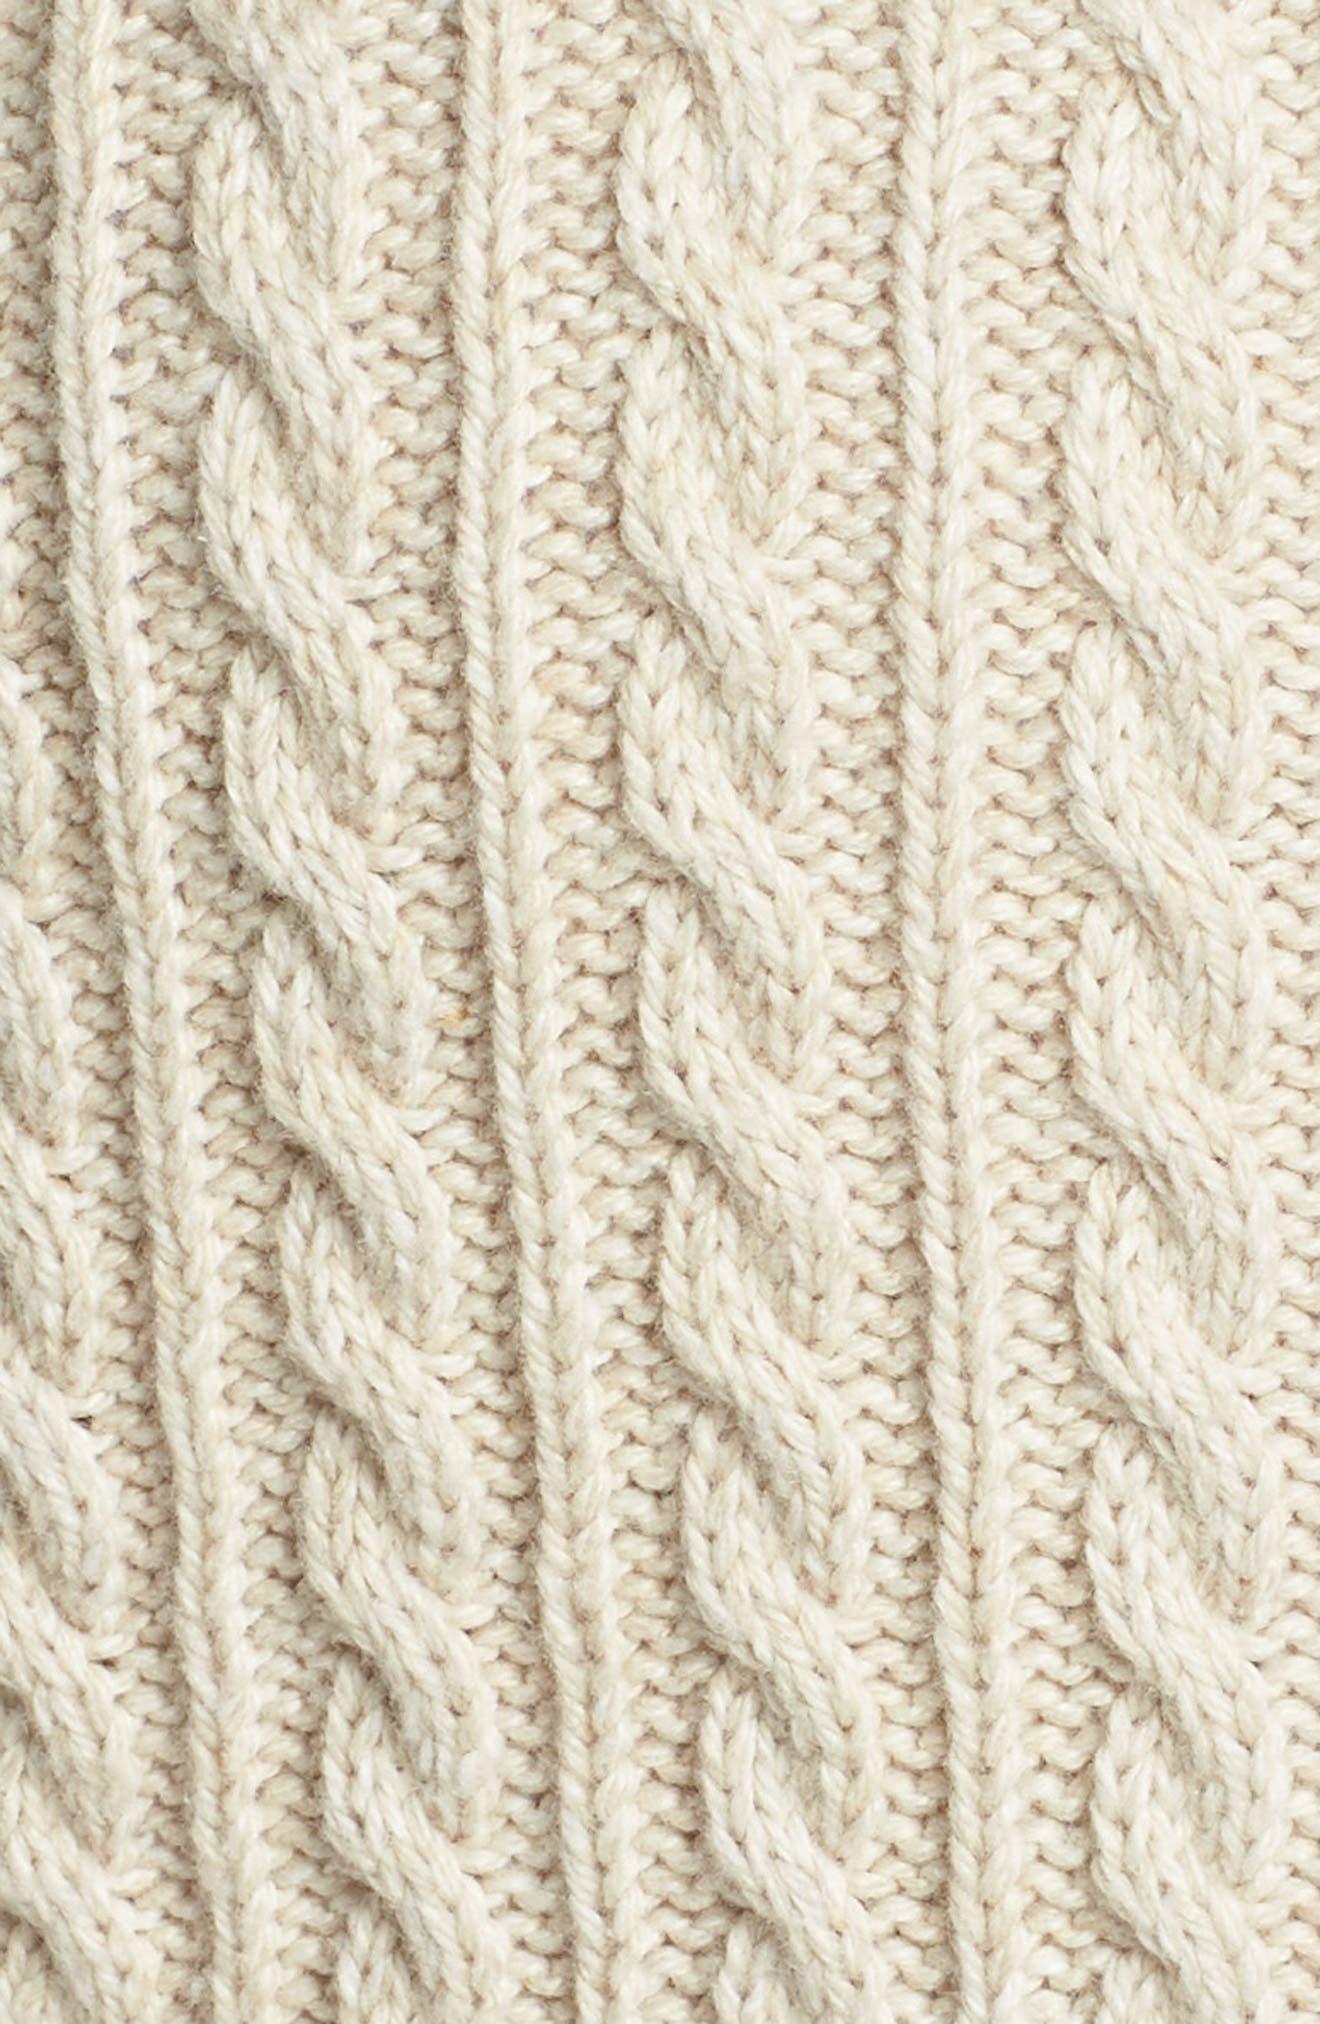 Colorblock Cable Knit Button Cardigan,                             Alternate thumbnail 6, color,                             900